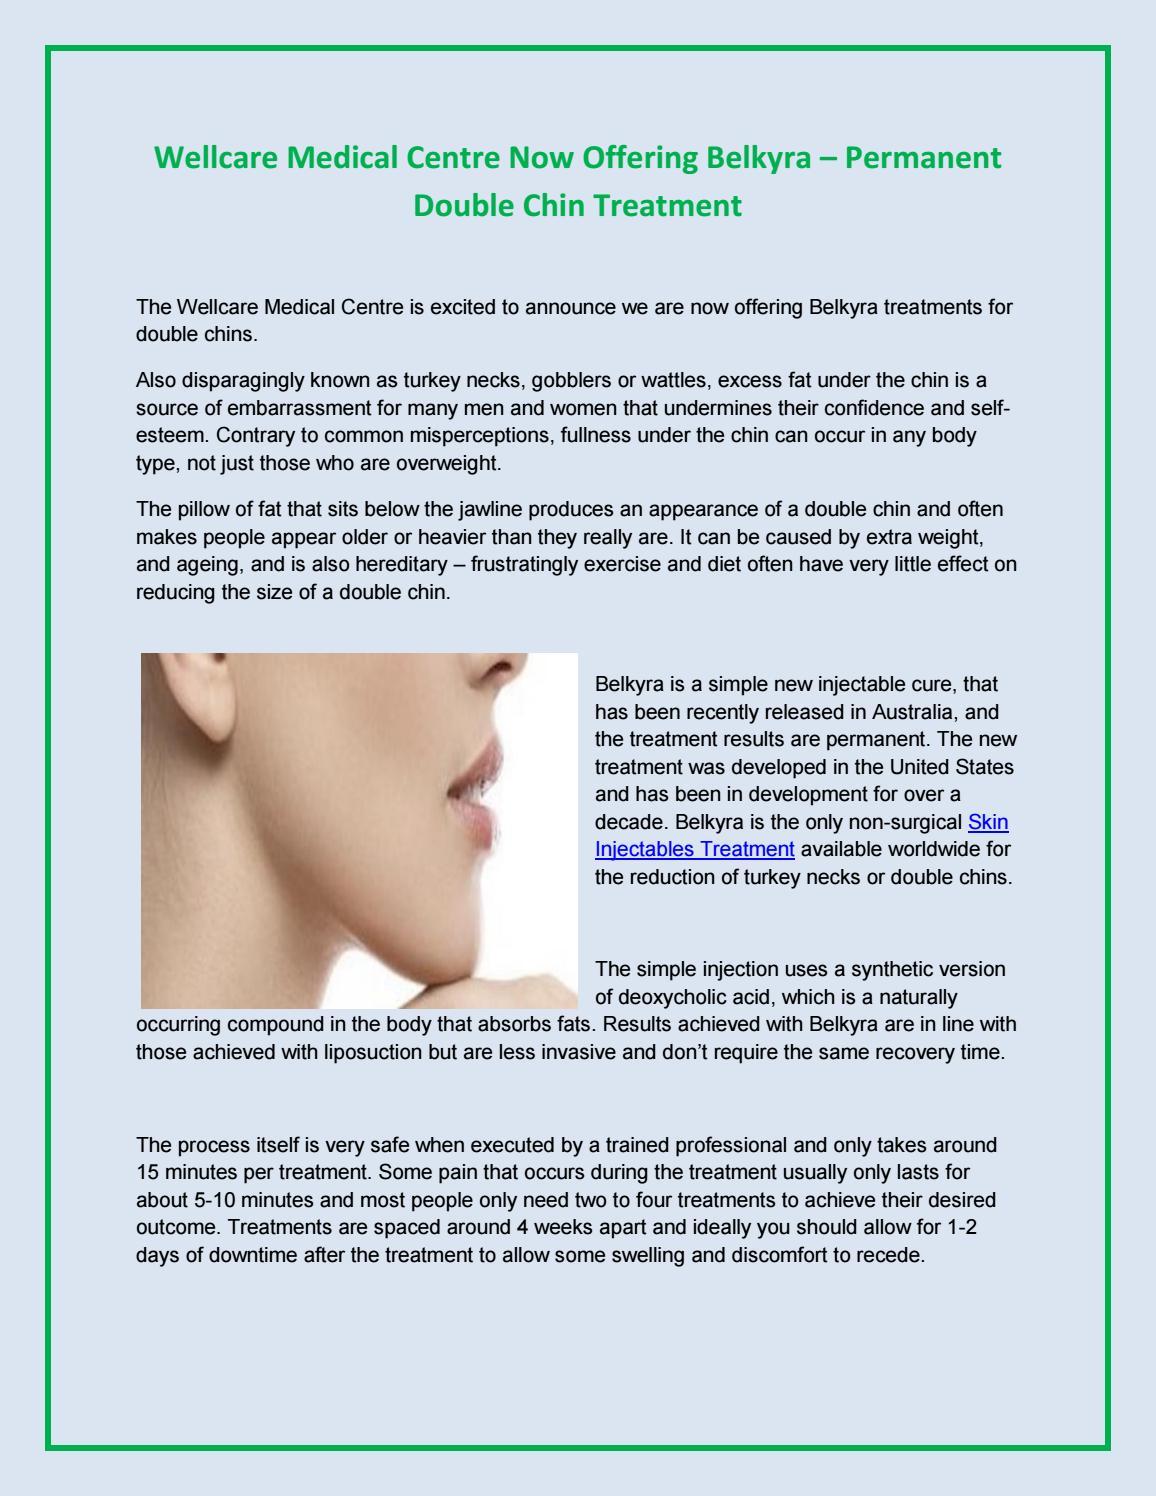 Reduce fat below chin